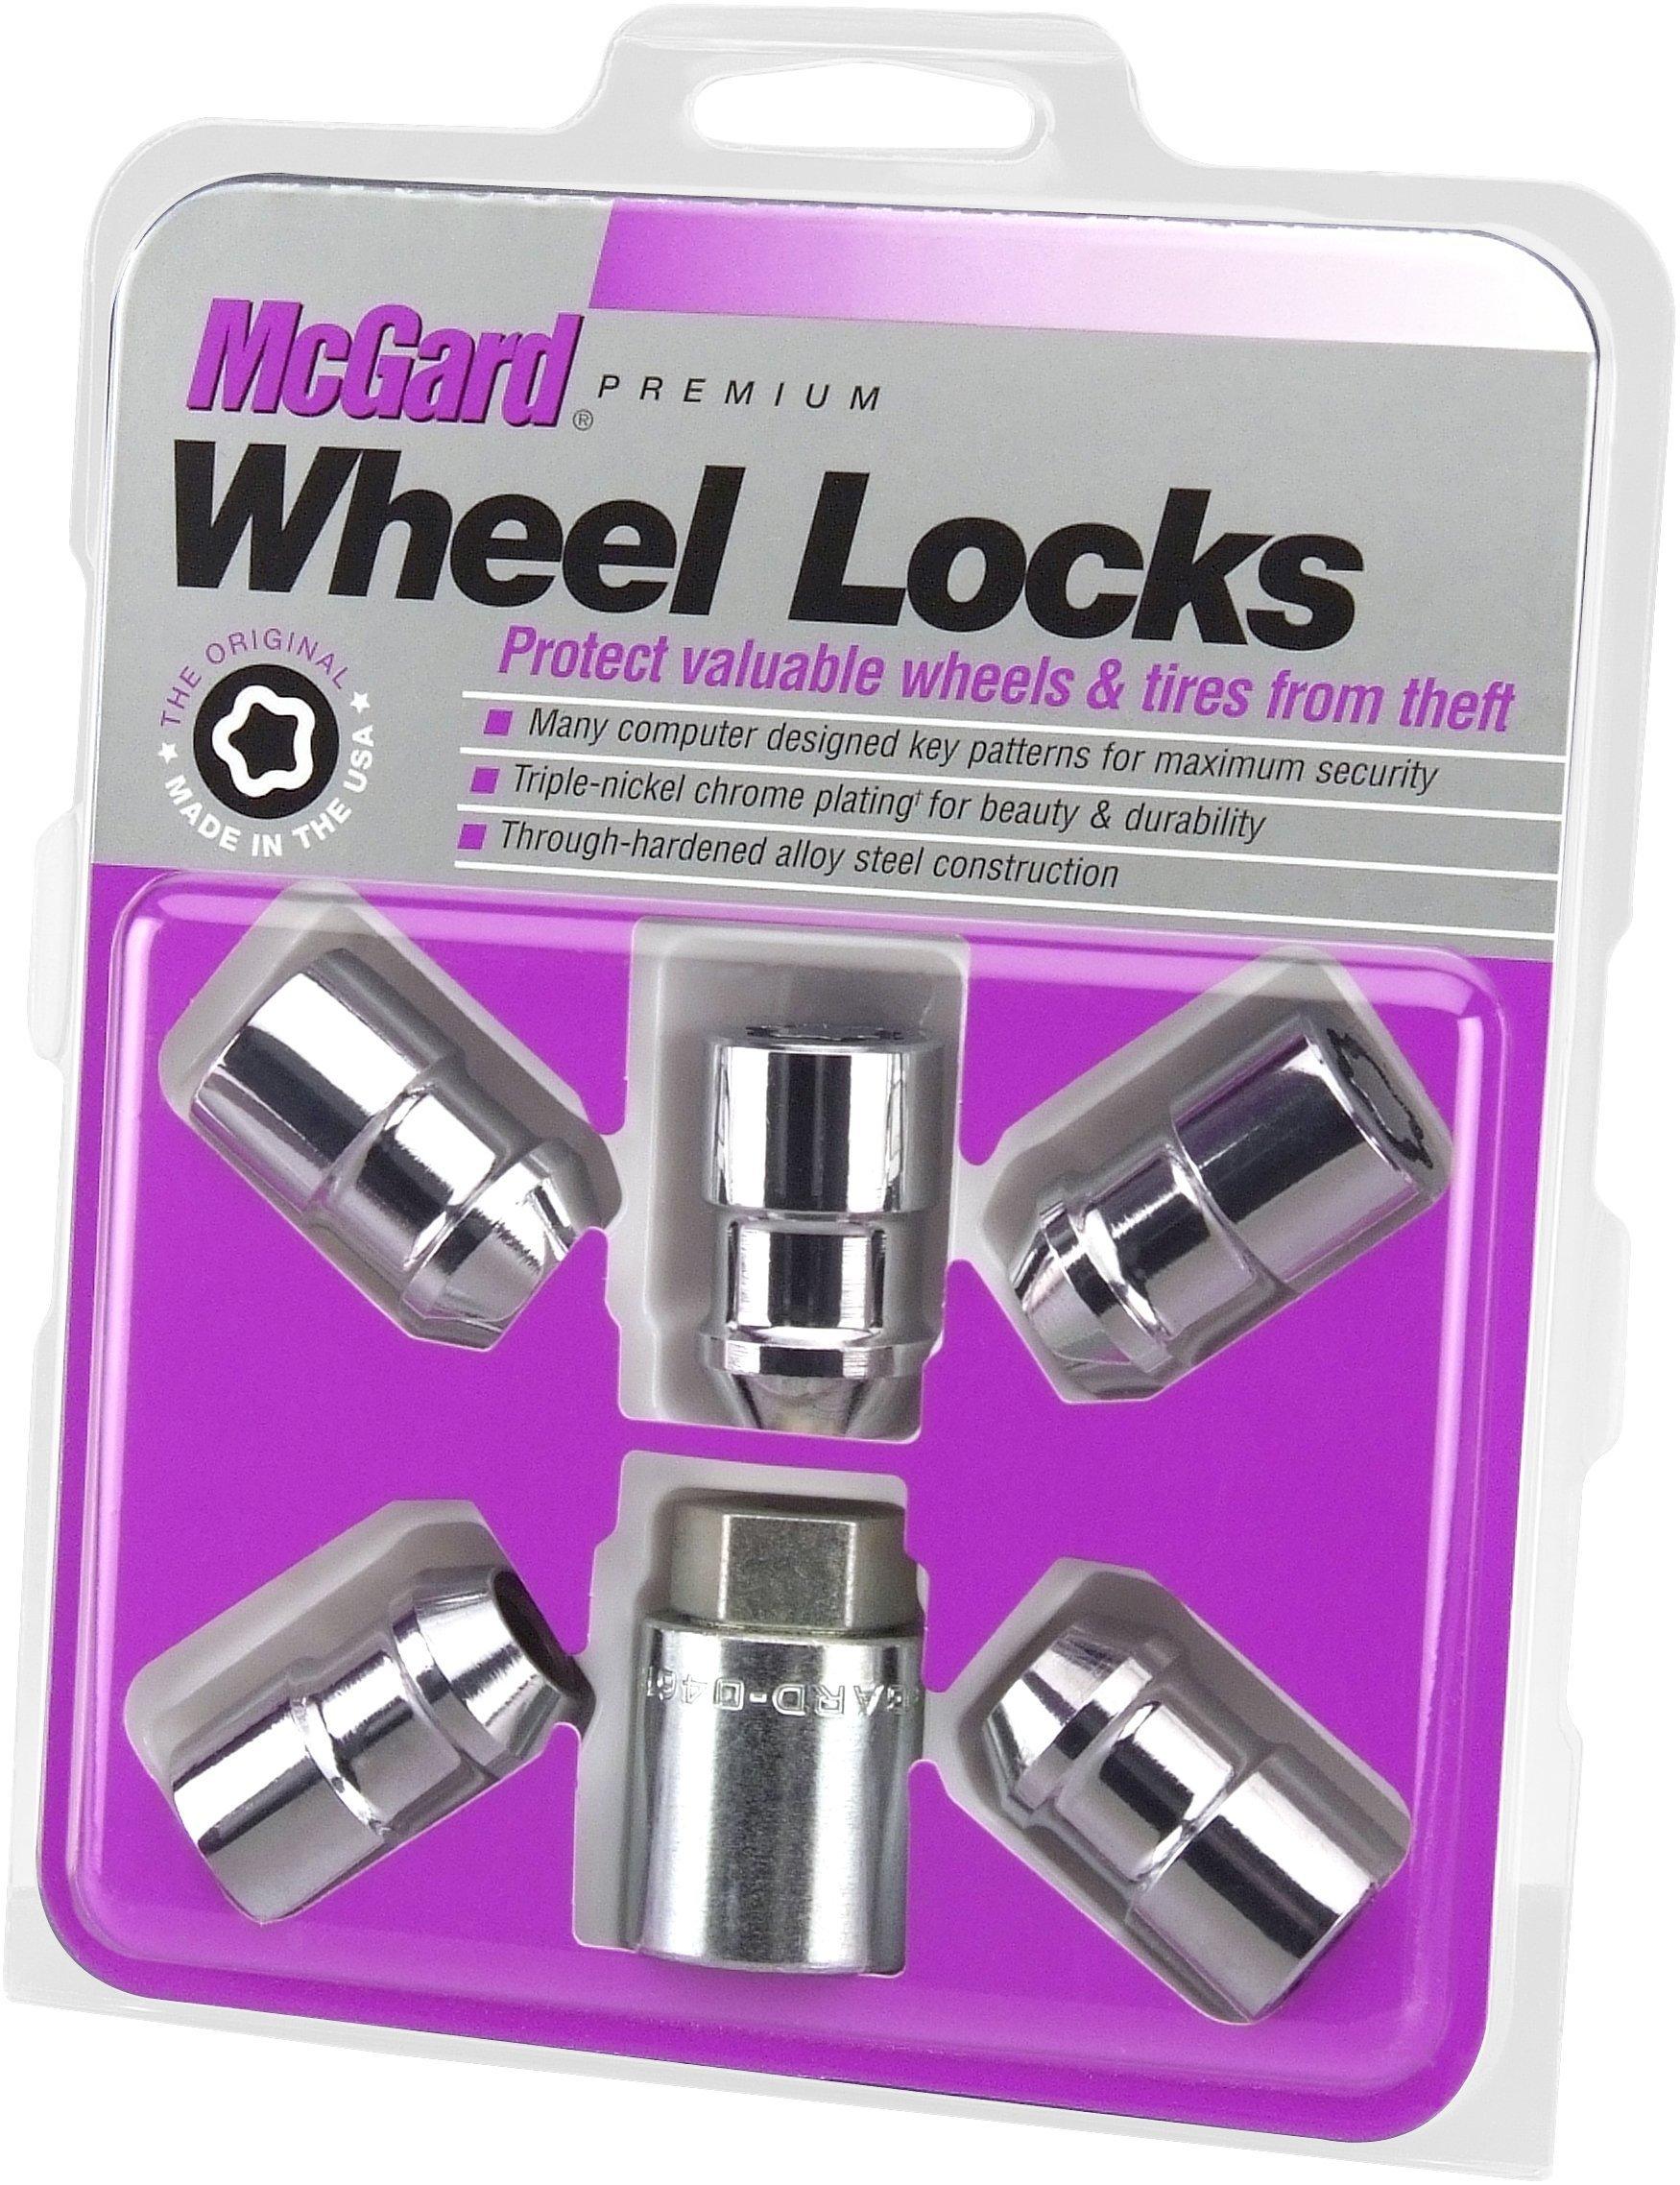 McGard 24538 Chrome Cone Seat Wheel Locks (1/2'' - 20 Thread Size) - Set of 5 by McGard (Image #1)